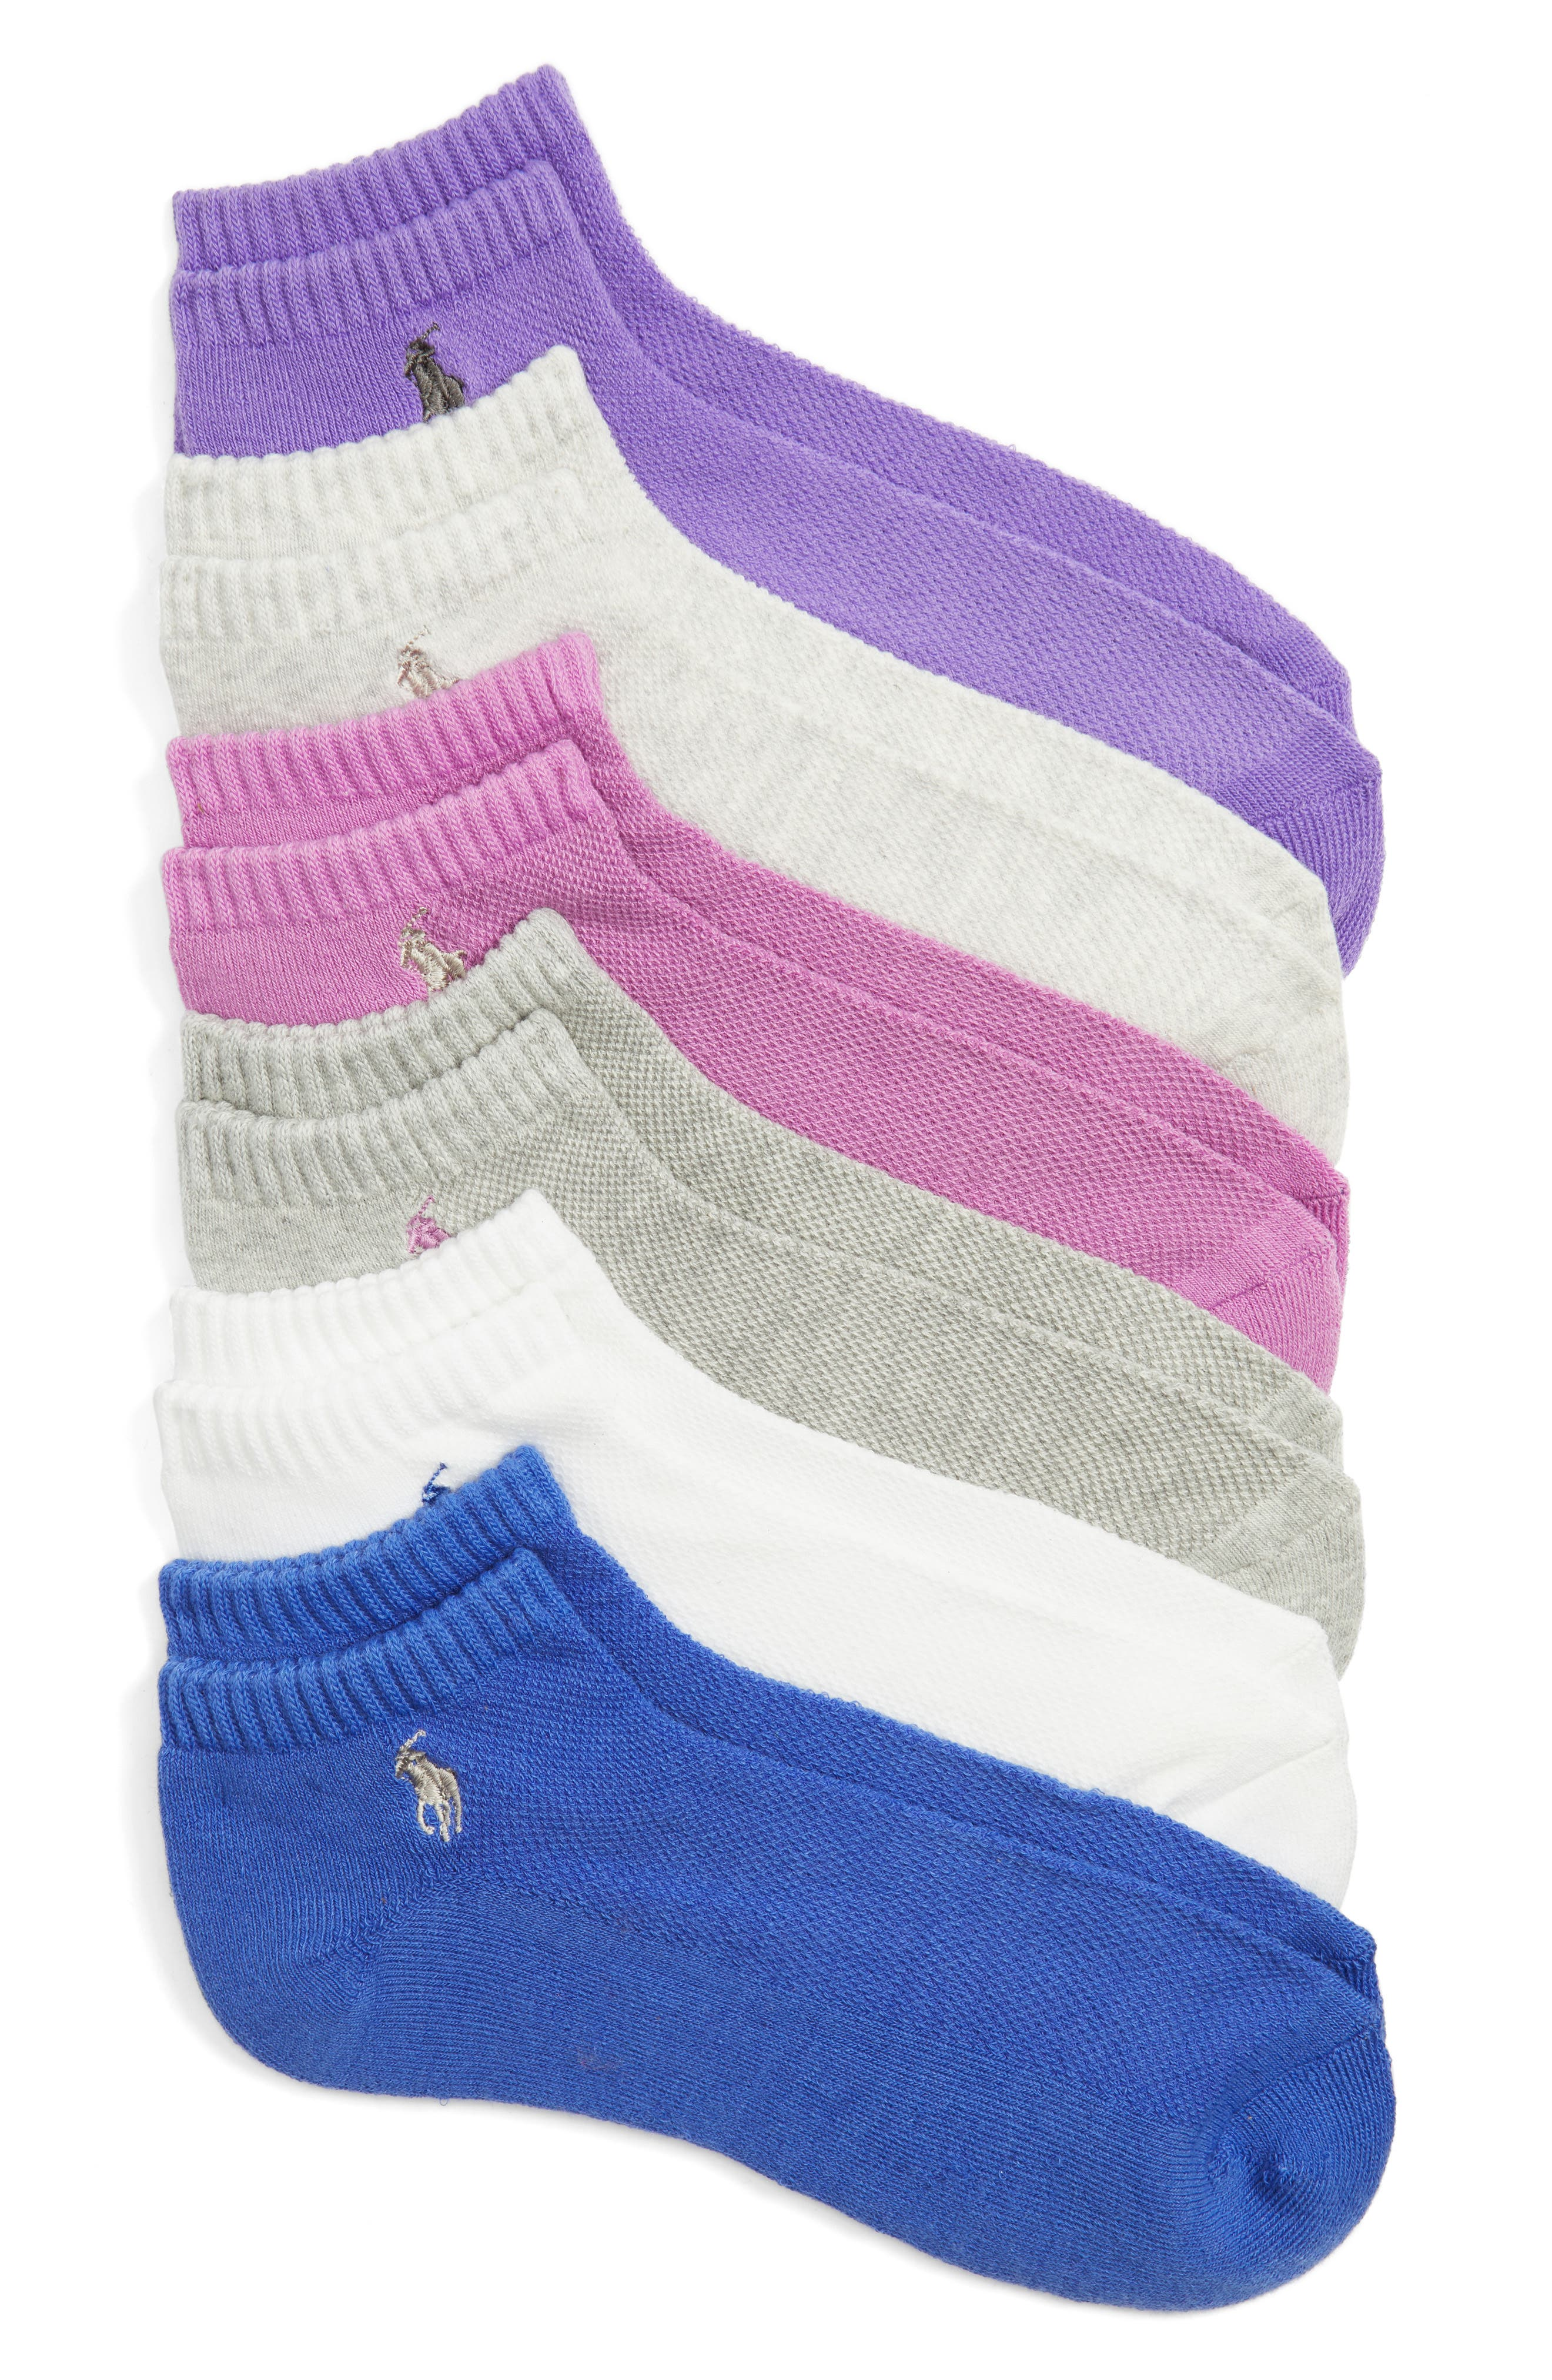 Sport 6-Pack Low-Cut Socks,                             Main thumbnail 1, color,                             651